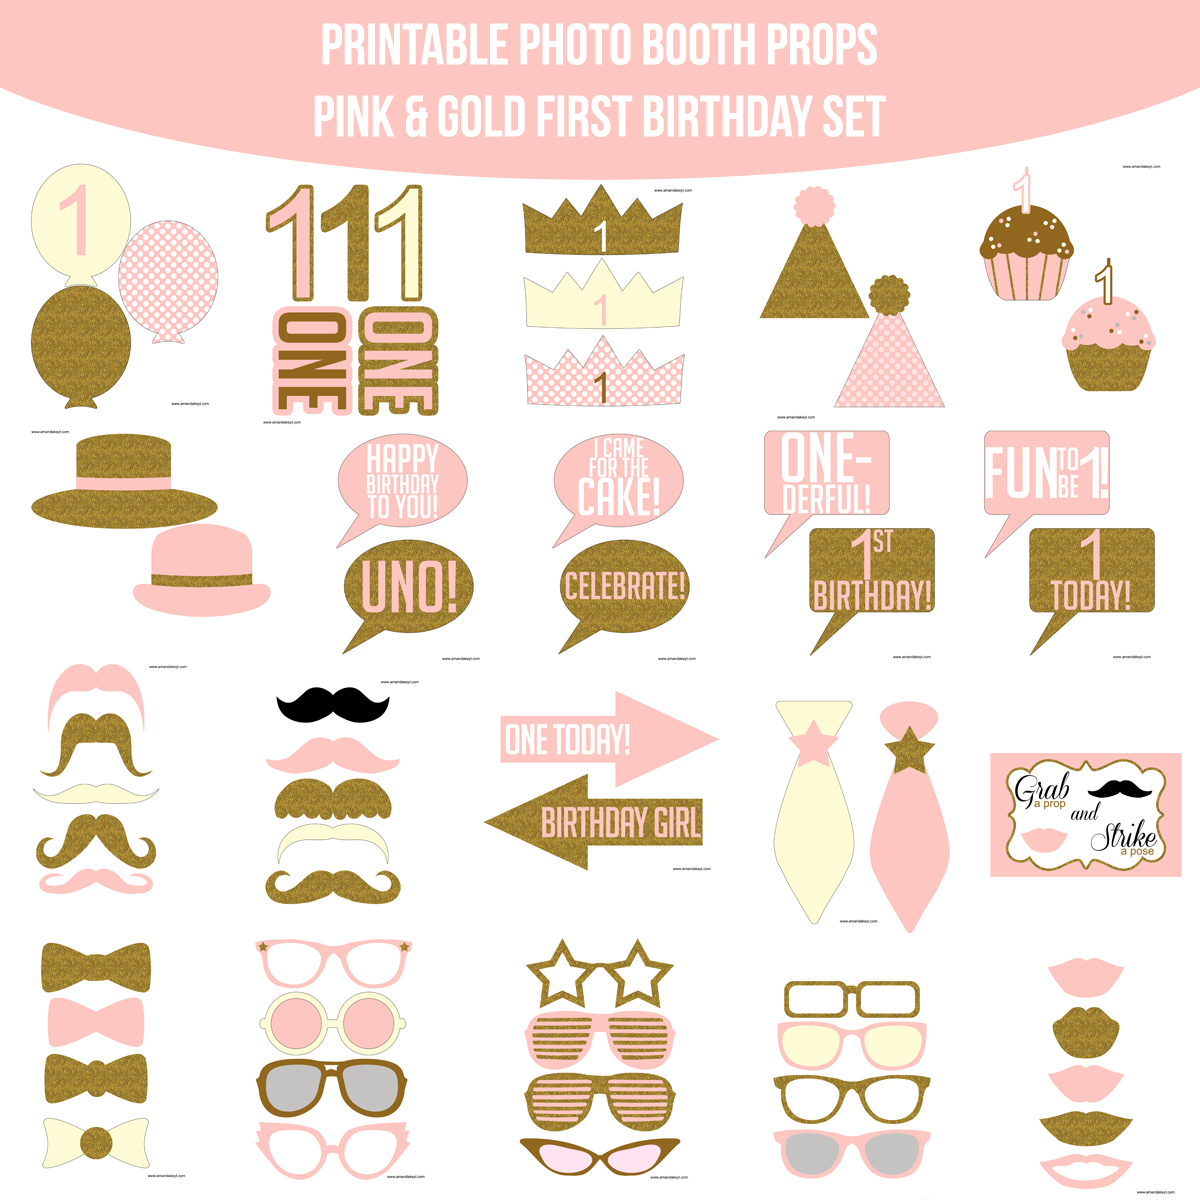 photo regarding Free Printable Photo Booth Props Birthday named Princess Amanda Keyt Printable Strategies